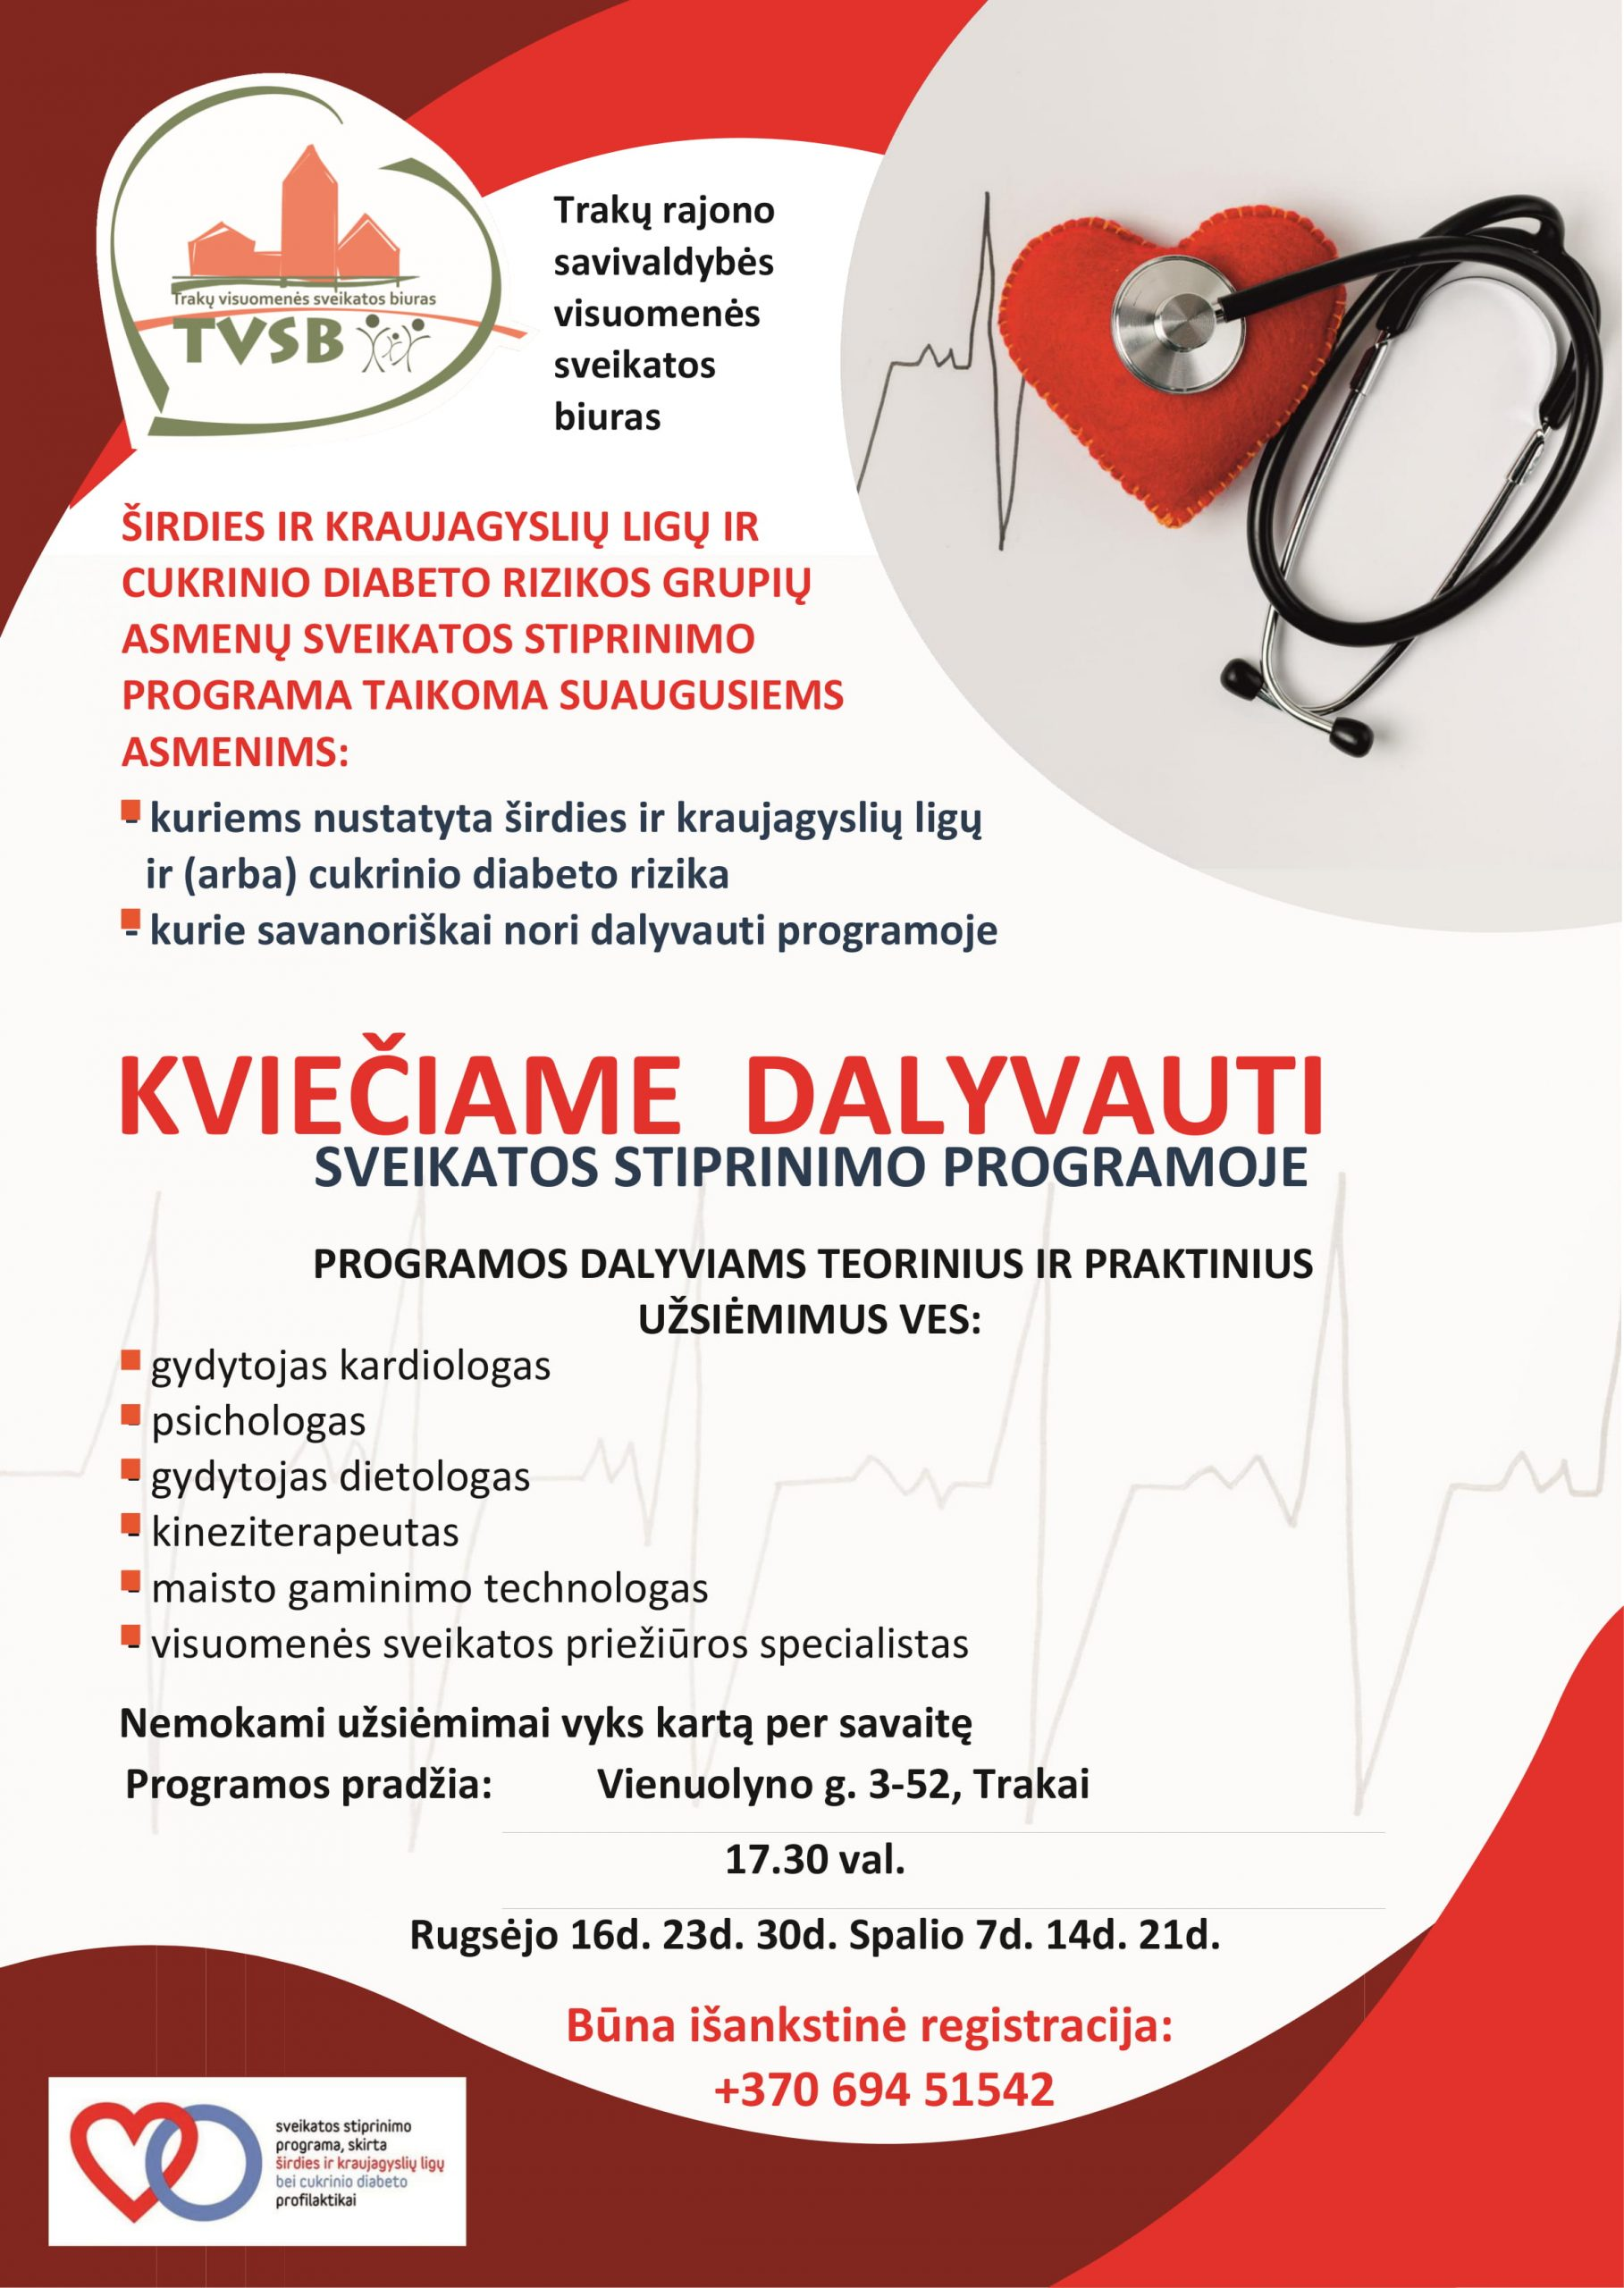 hipertenzija fizinio krūvio metu